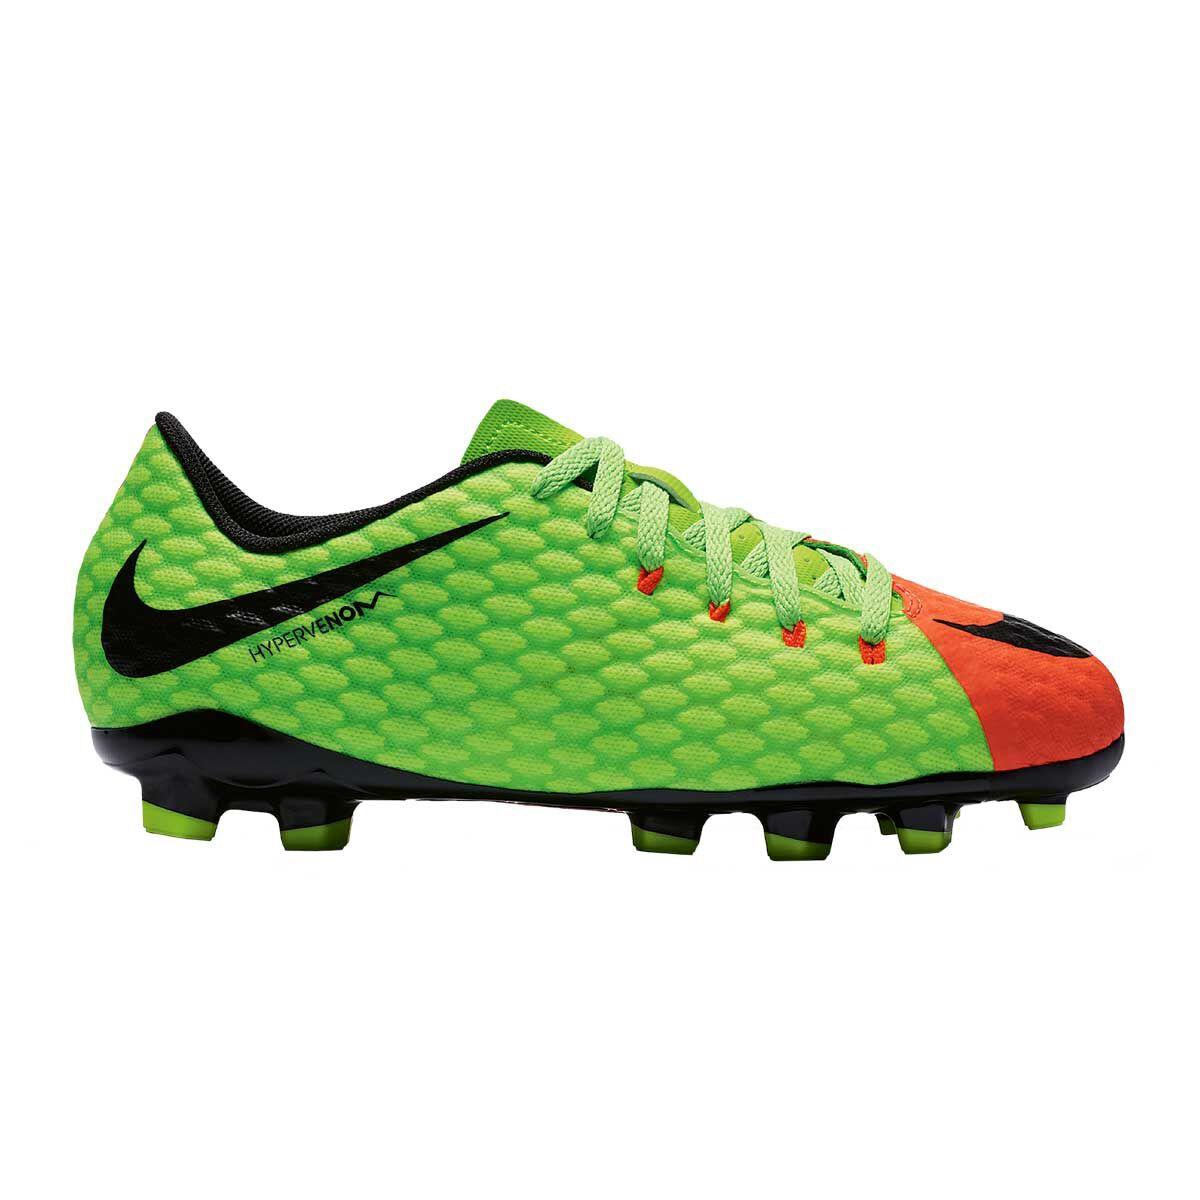 2c37d9f65 ... uk nike hypervenom phelon iii junior football boots green black us 1  junior green aa7ec 747e4